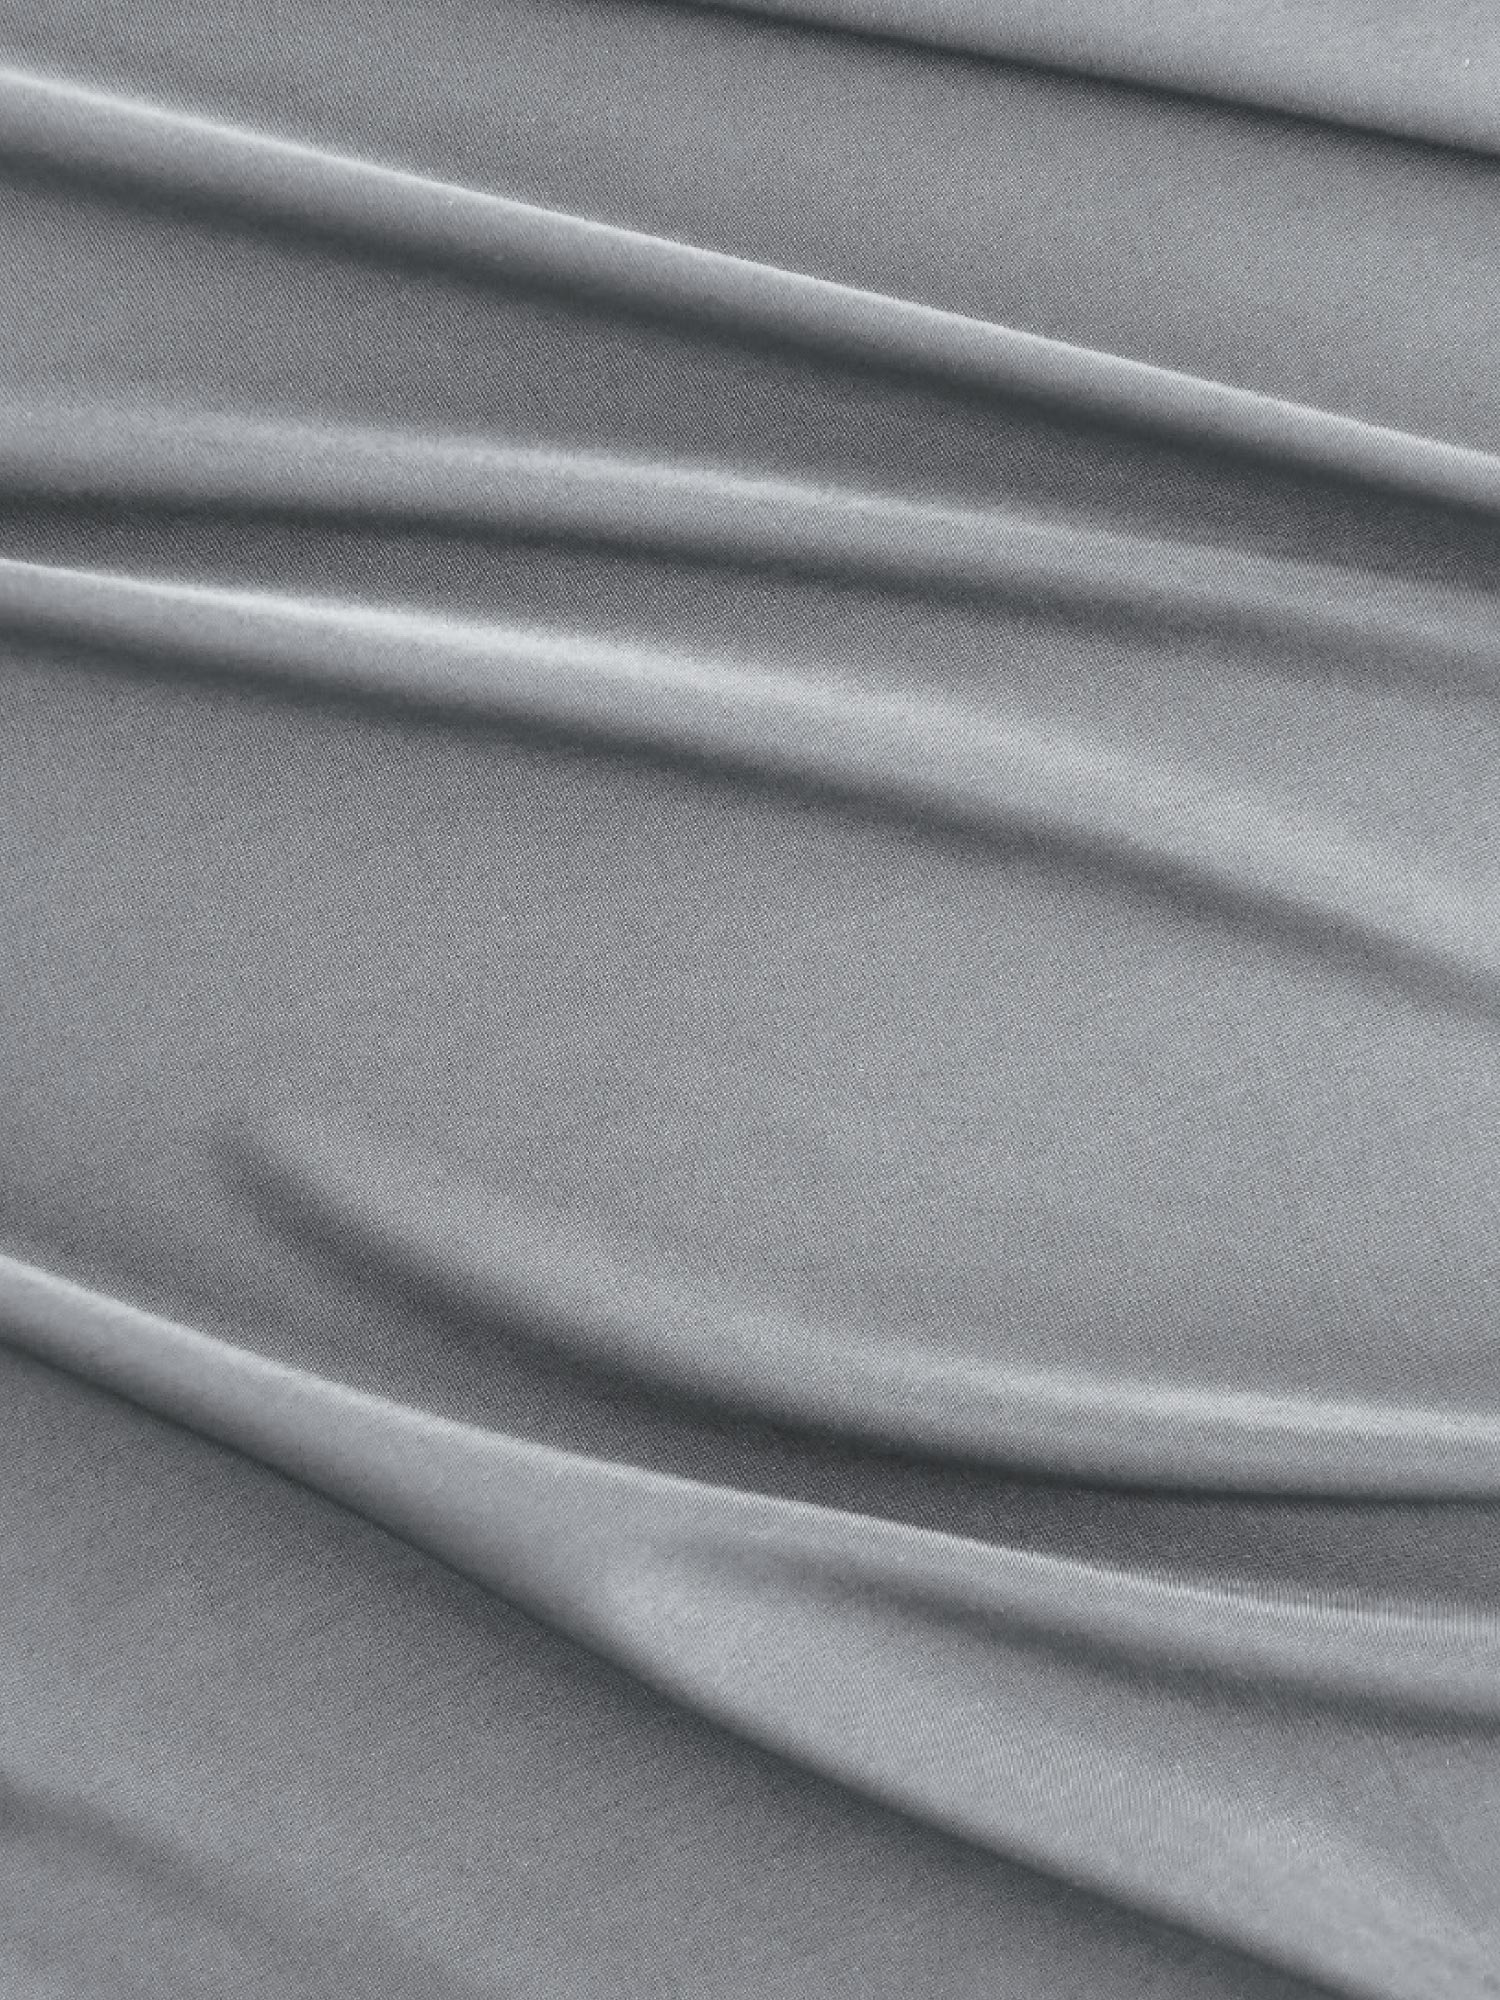 Ein angenehm trockenes Hautgefühl mit den Synthetik-Fasern | mey®